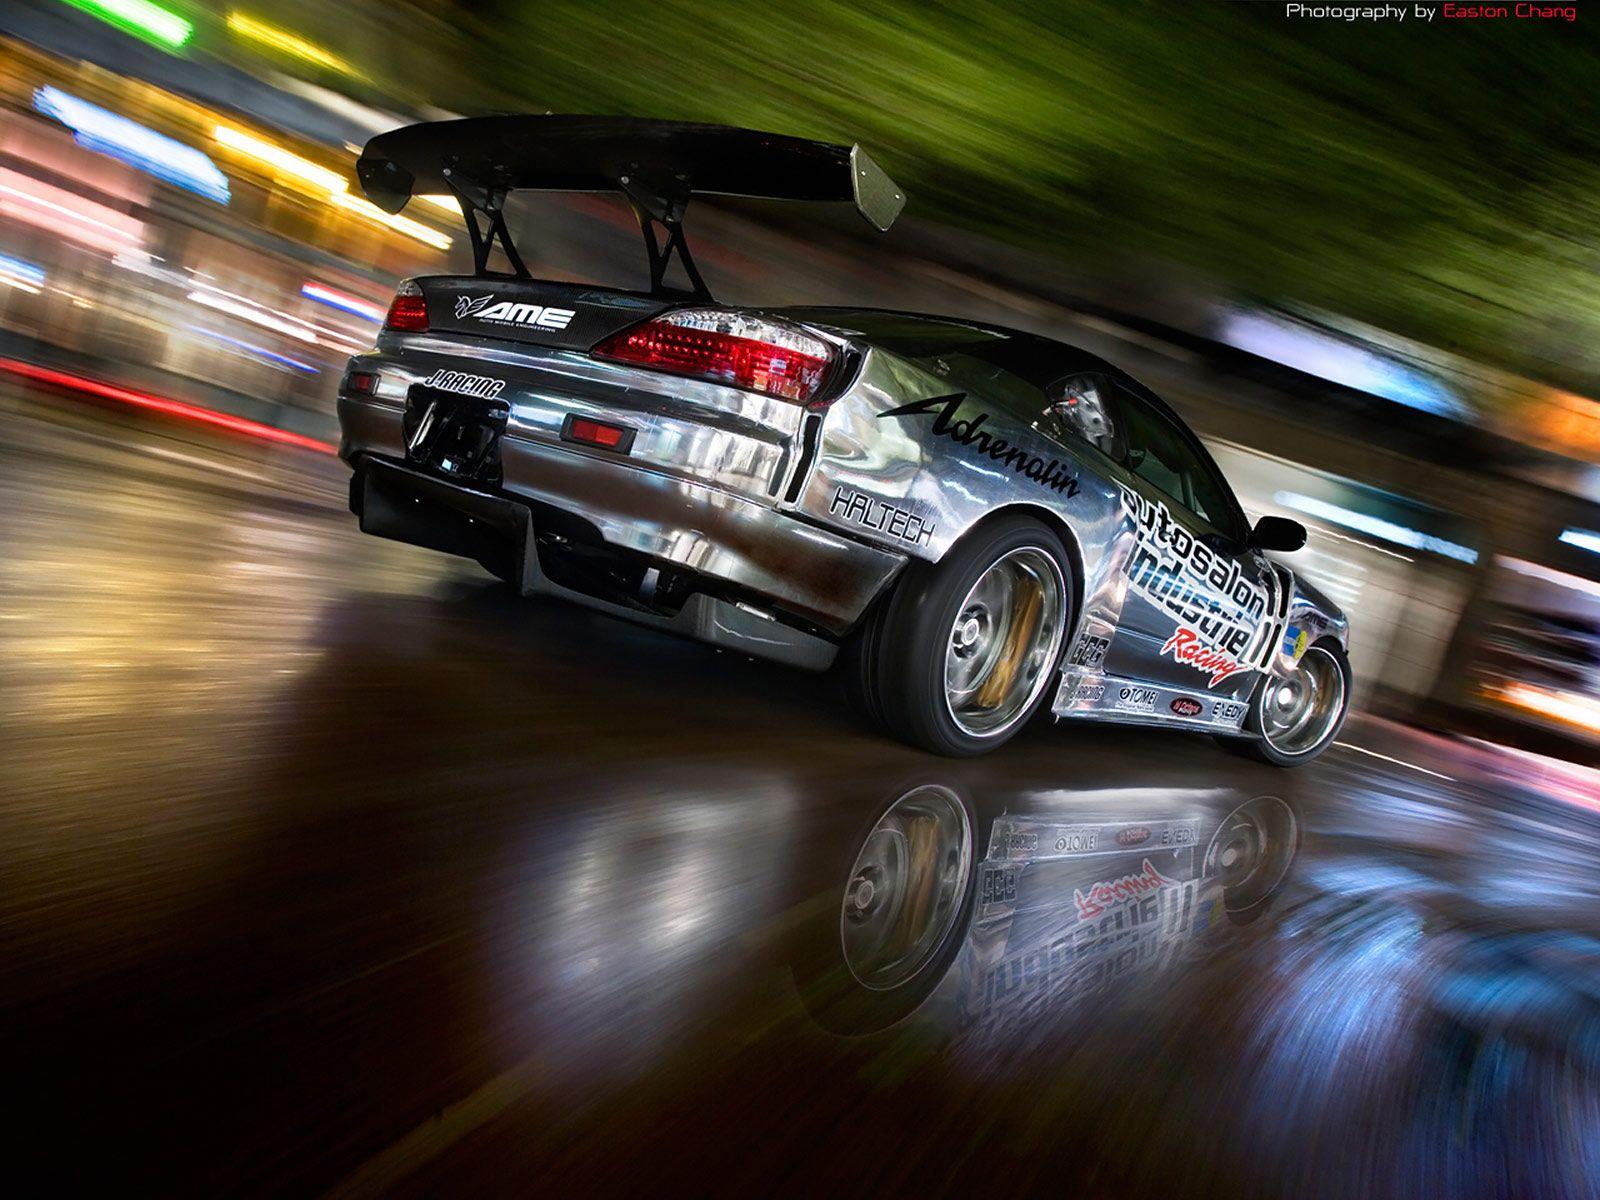 Drifting Cars Wallpaper - WallpaperSafari